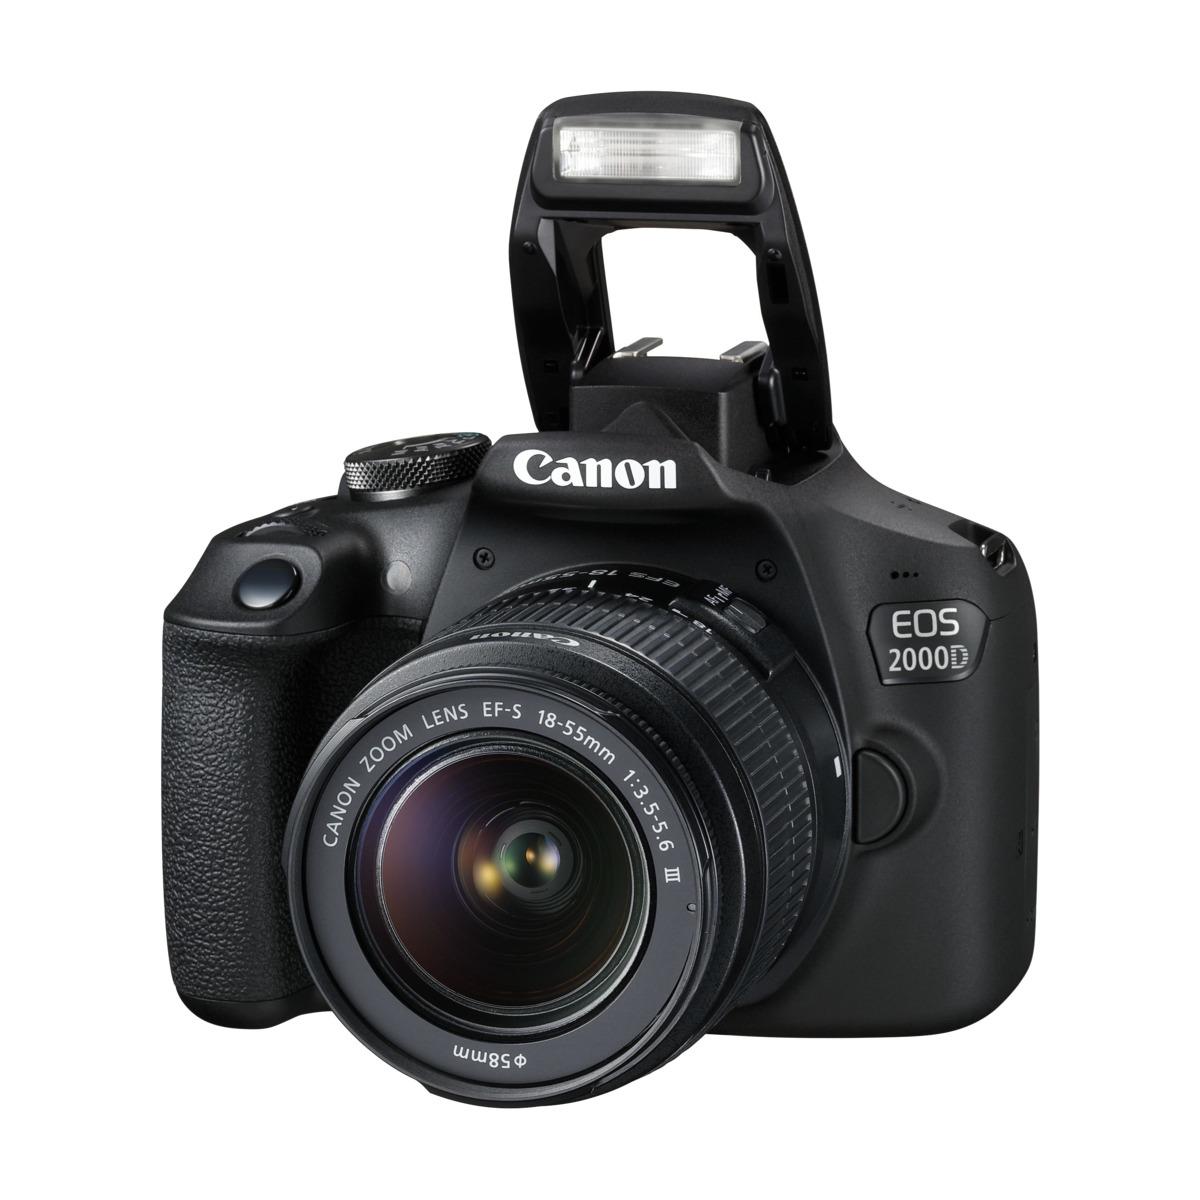 Canon EOS 2000D 18 55 IS II Black | På lager | Billig